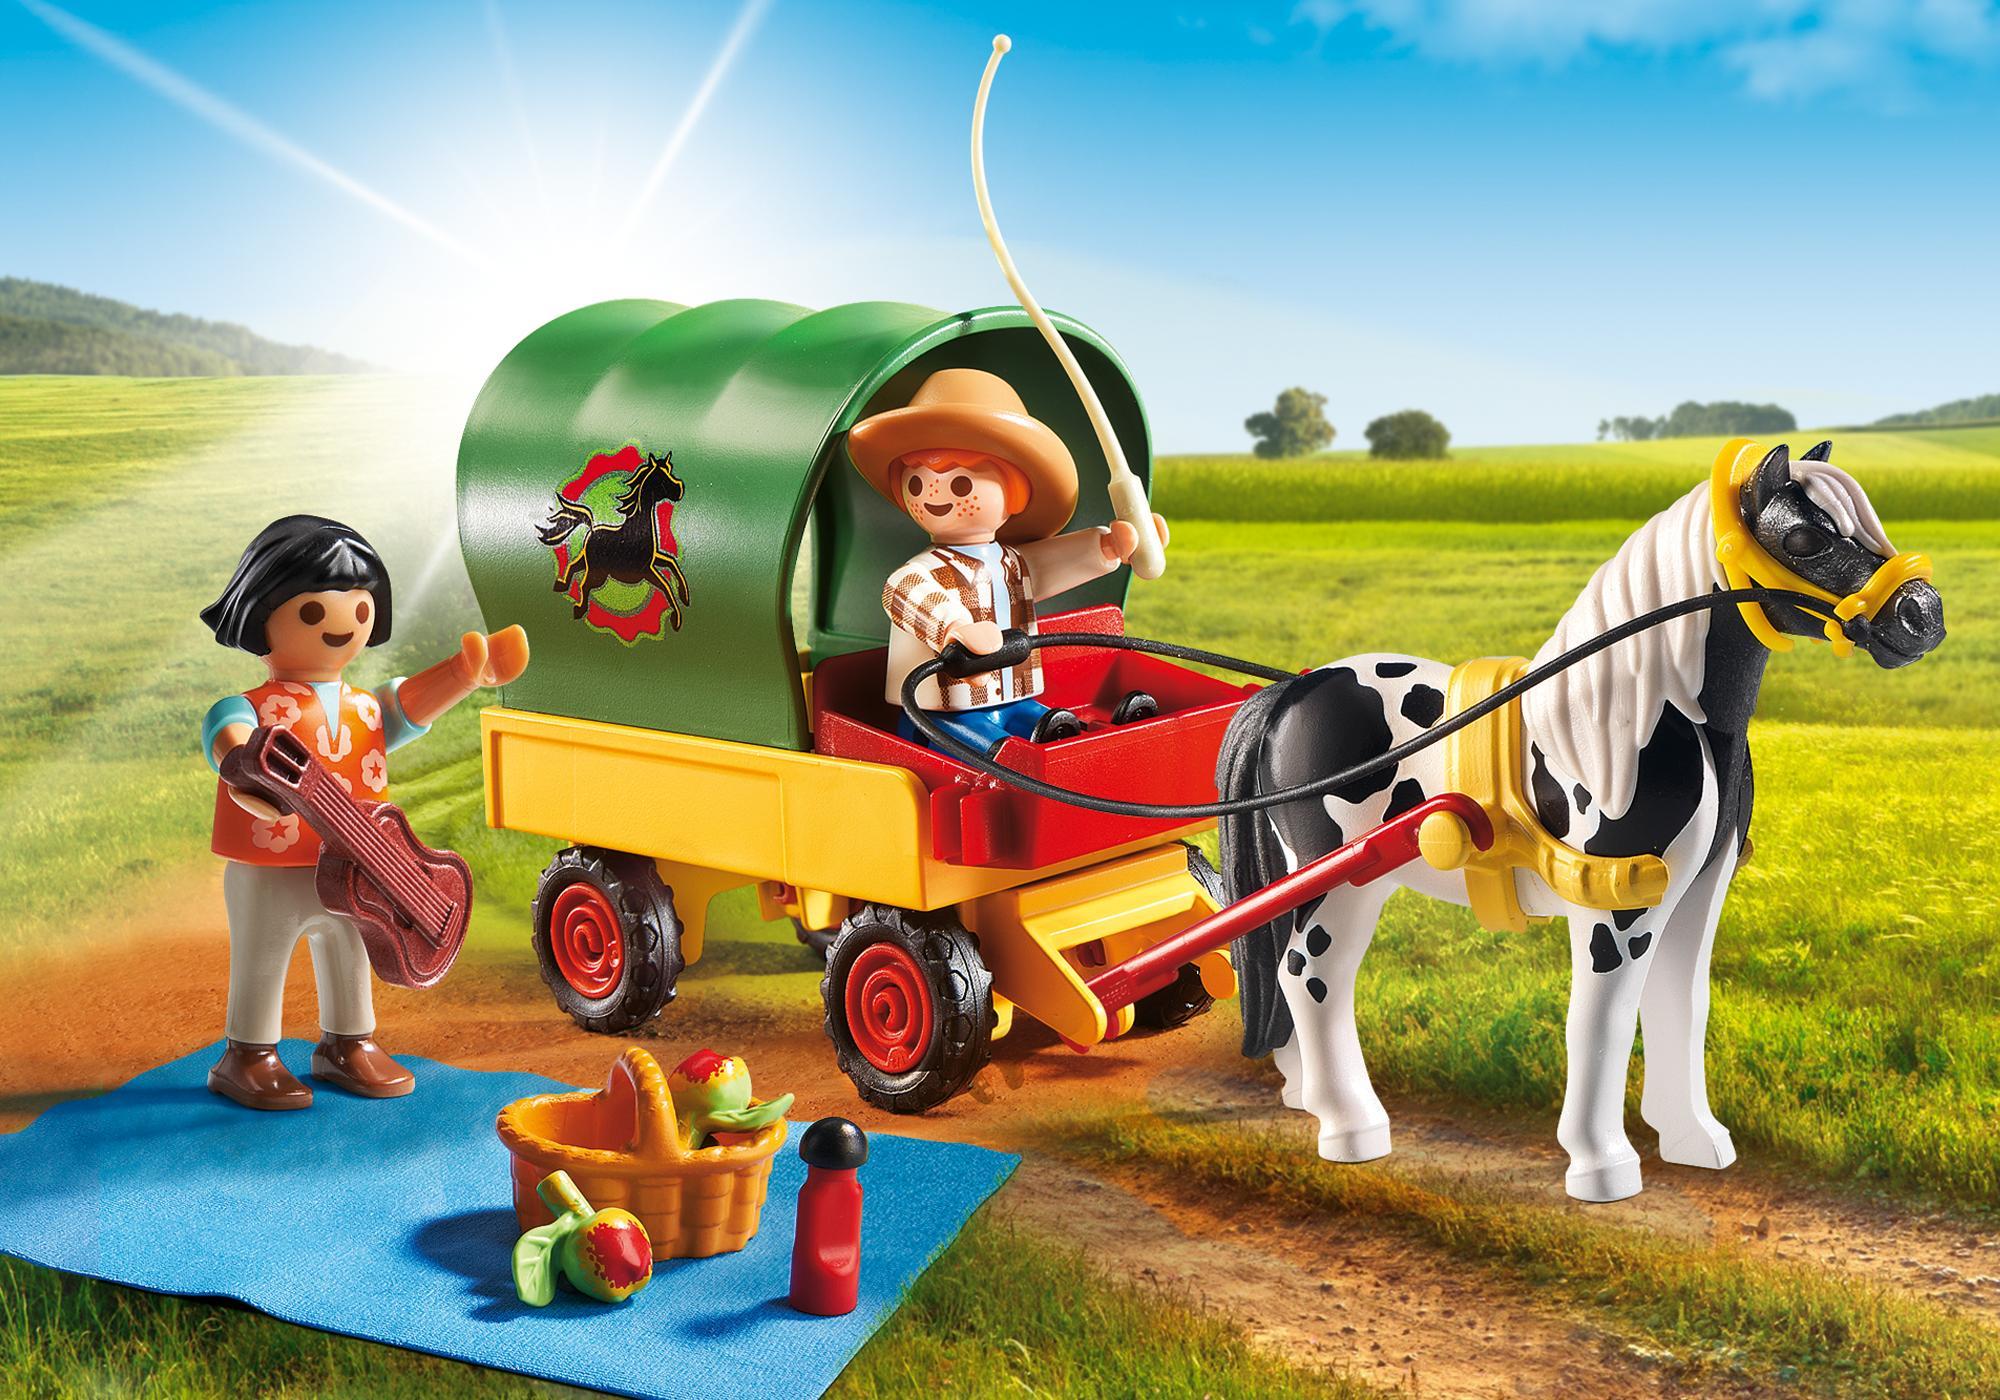 http://media.playmobil.com/i/playmobil/5686_product_detail/Picnic with Pony Wagon